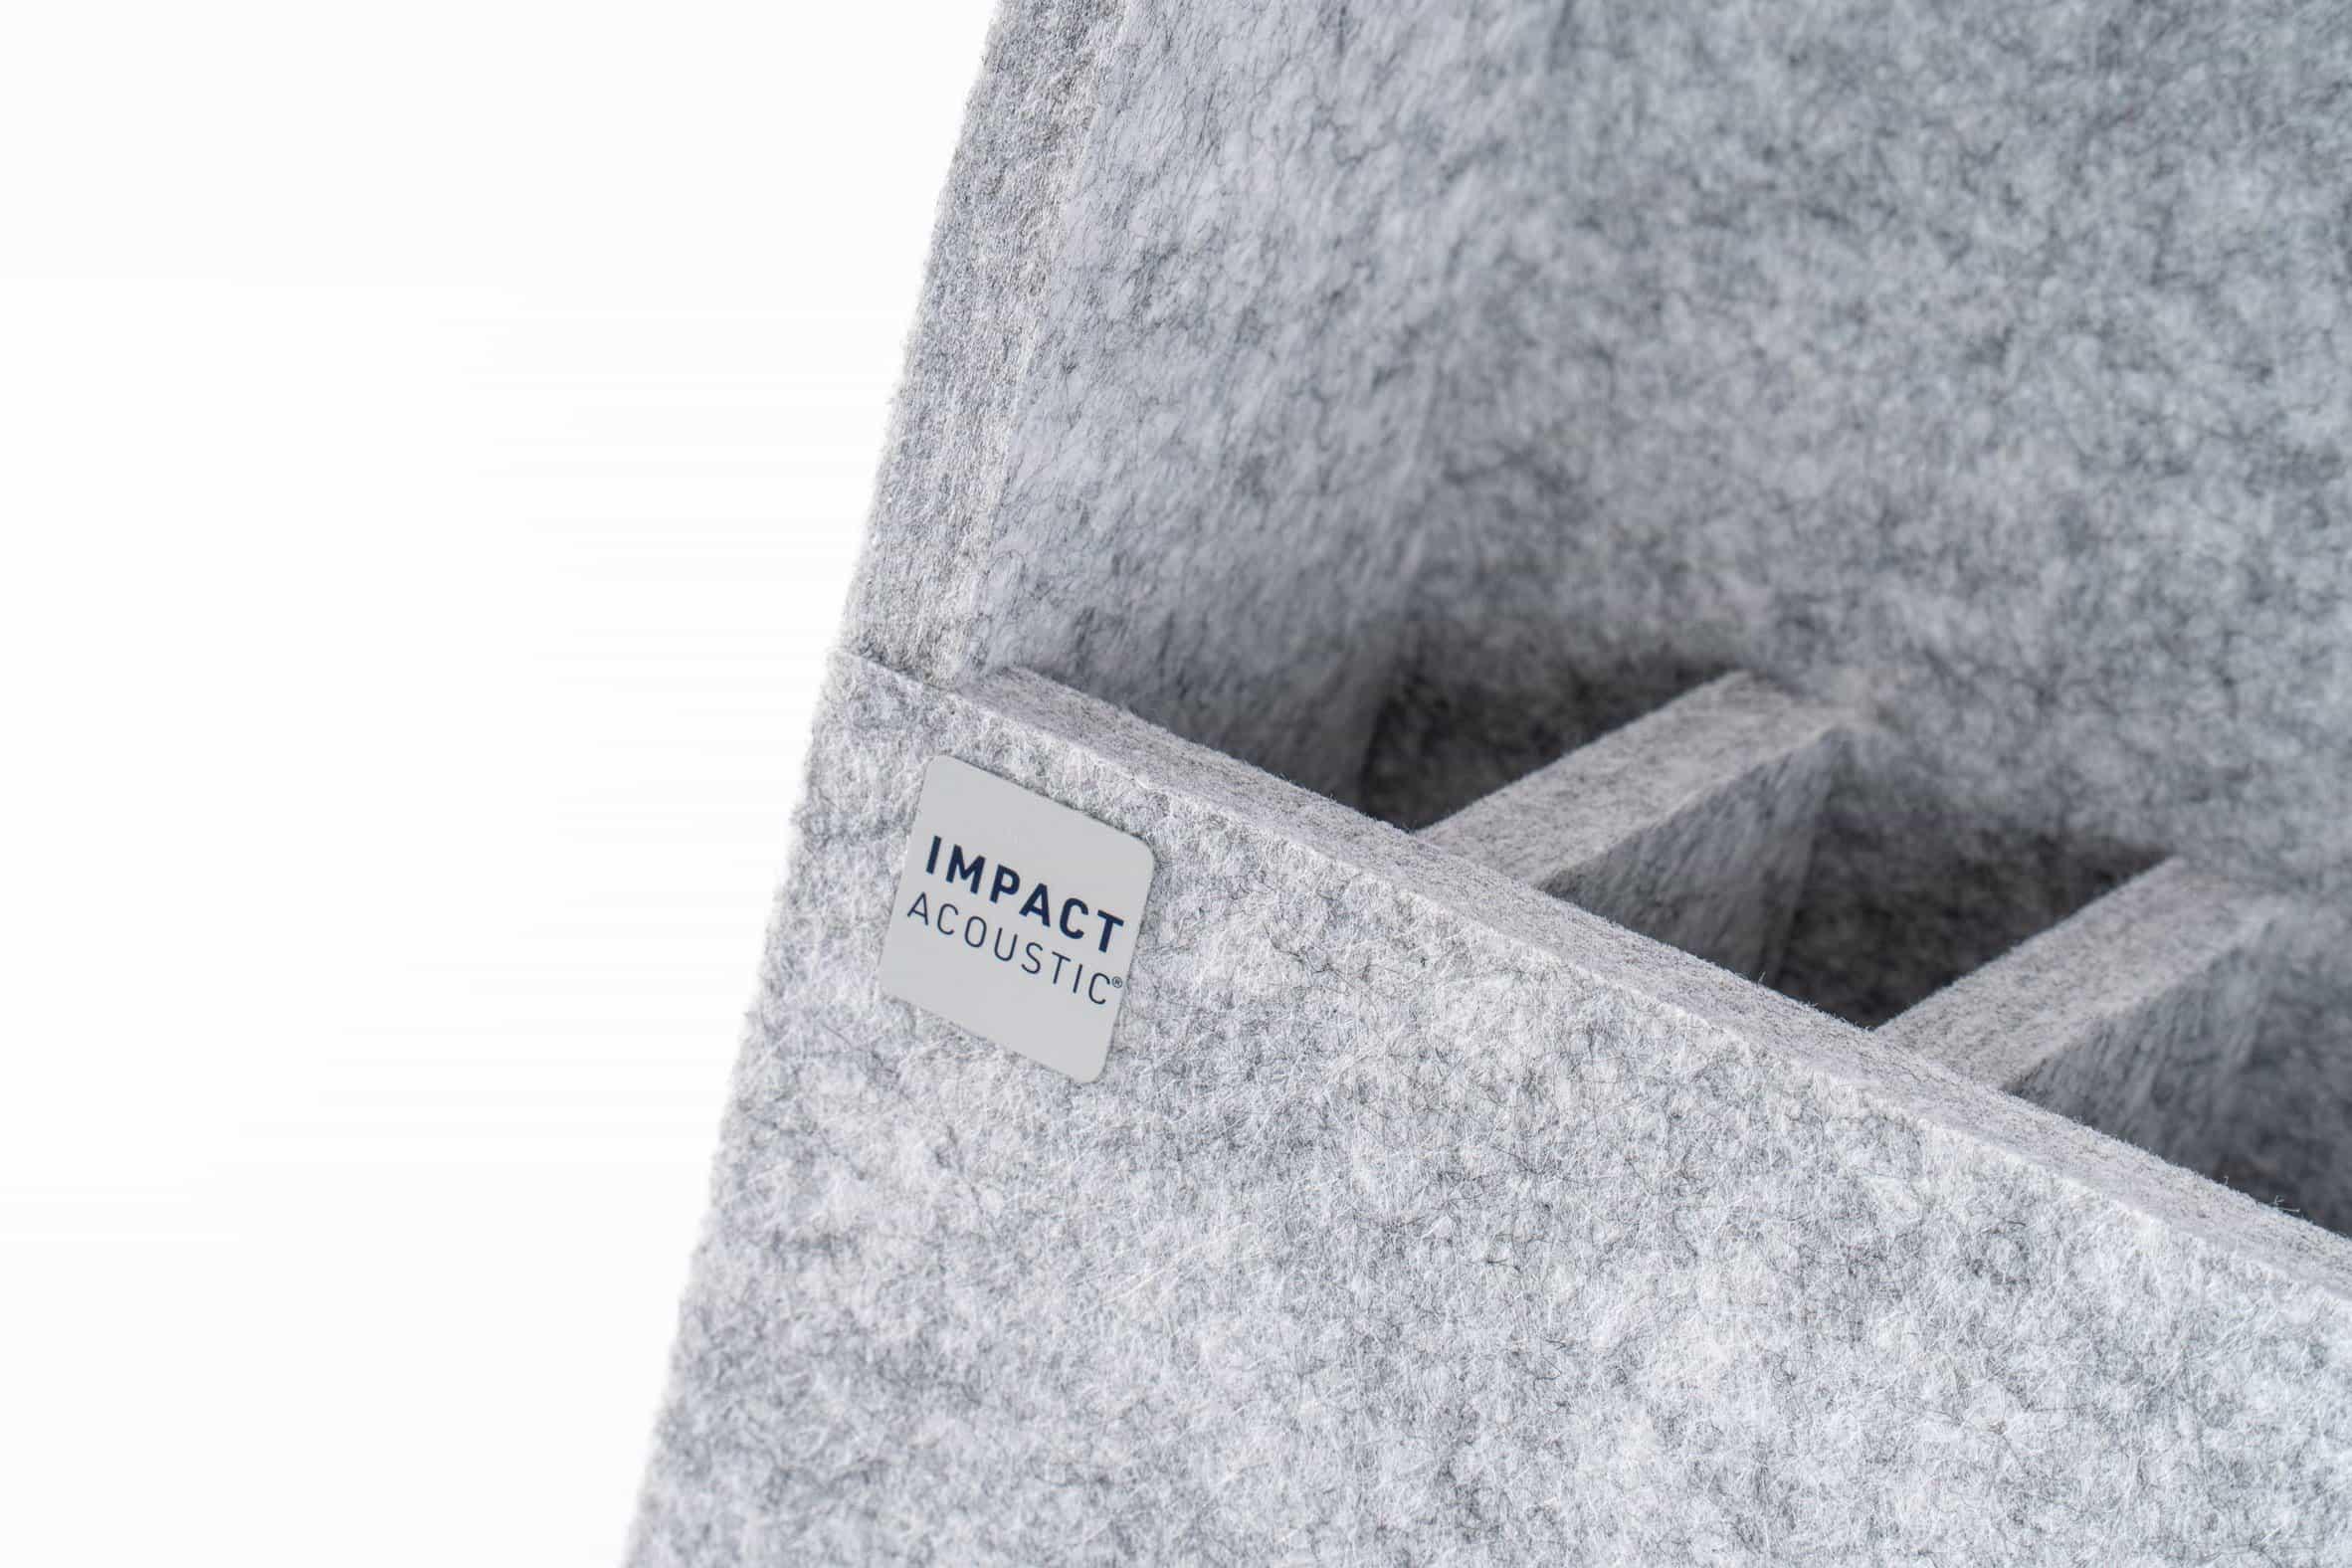 Organizador de escritorio acústico TwoWay de Impact Acoustic en fieltro gris